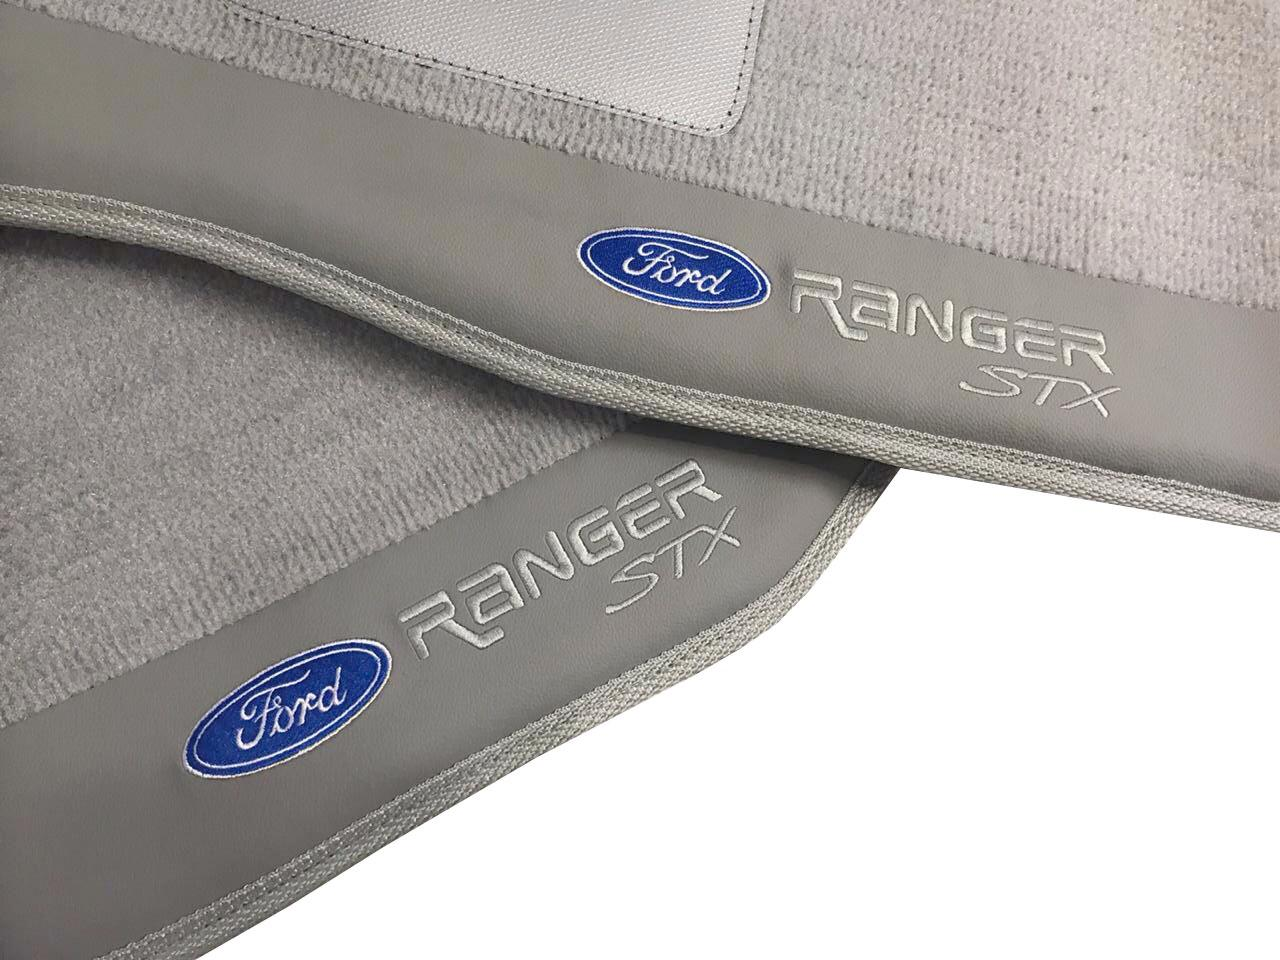 Tapete Ford Ranger Stx Carpete Premium